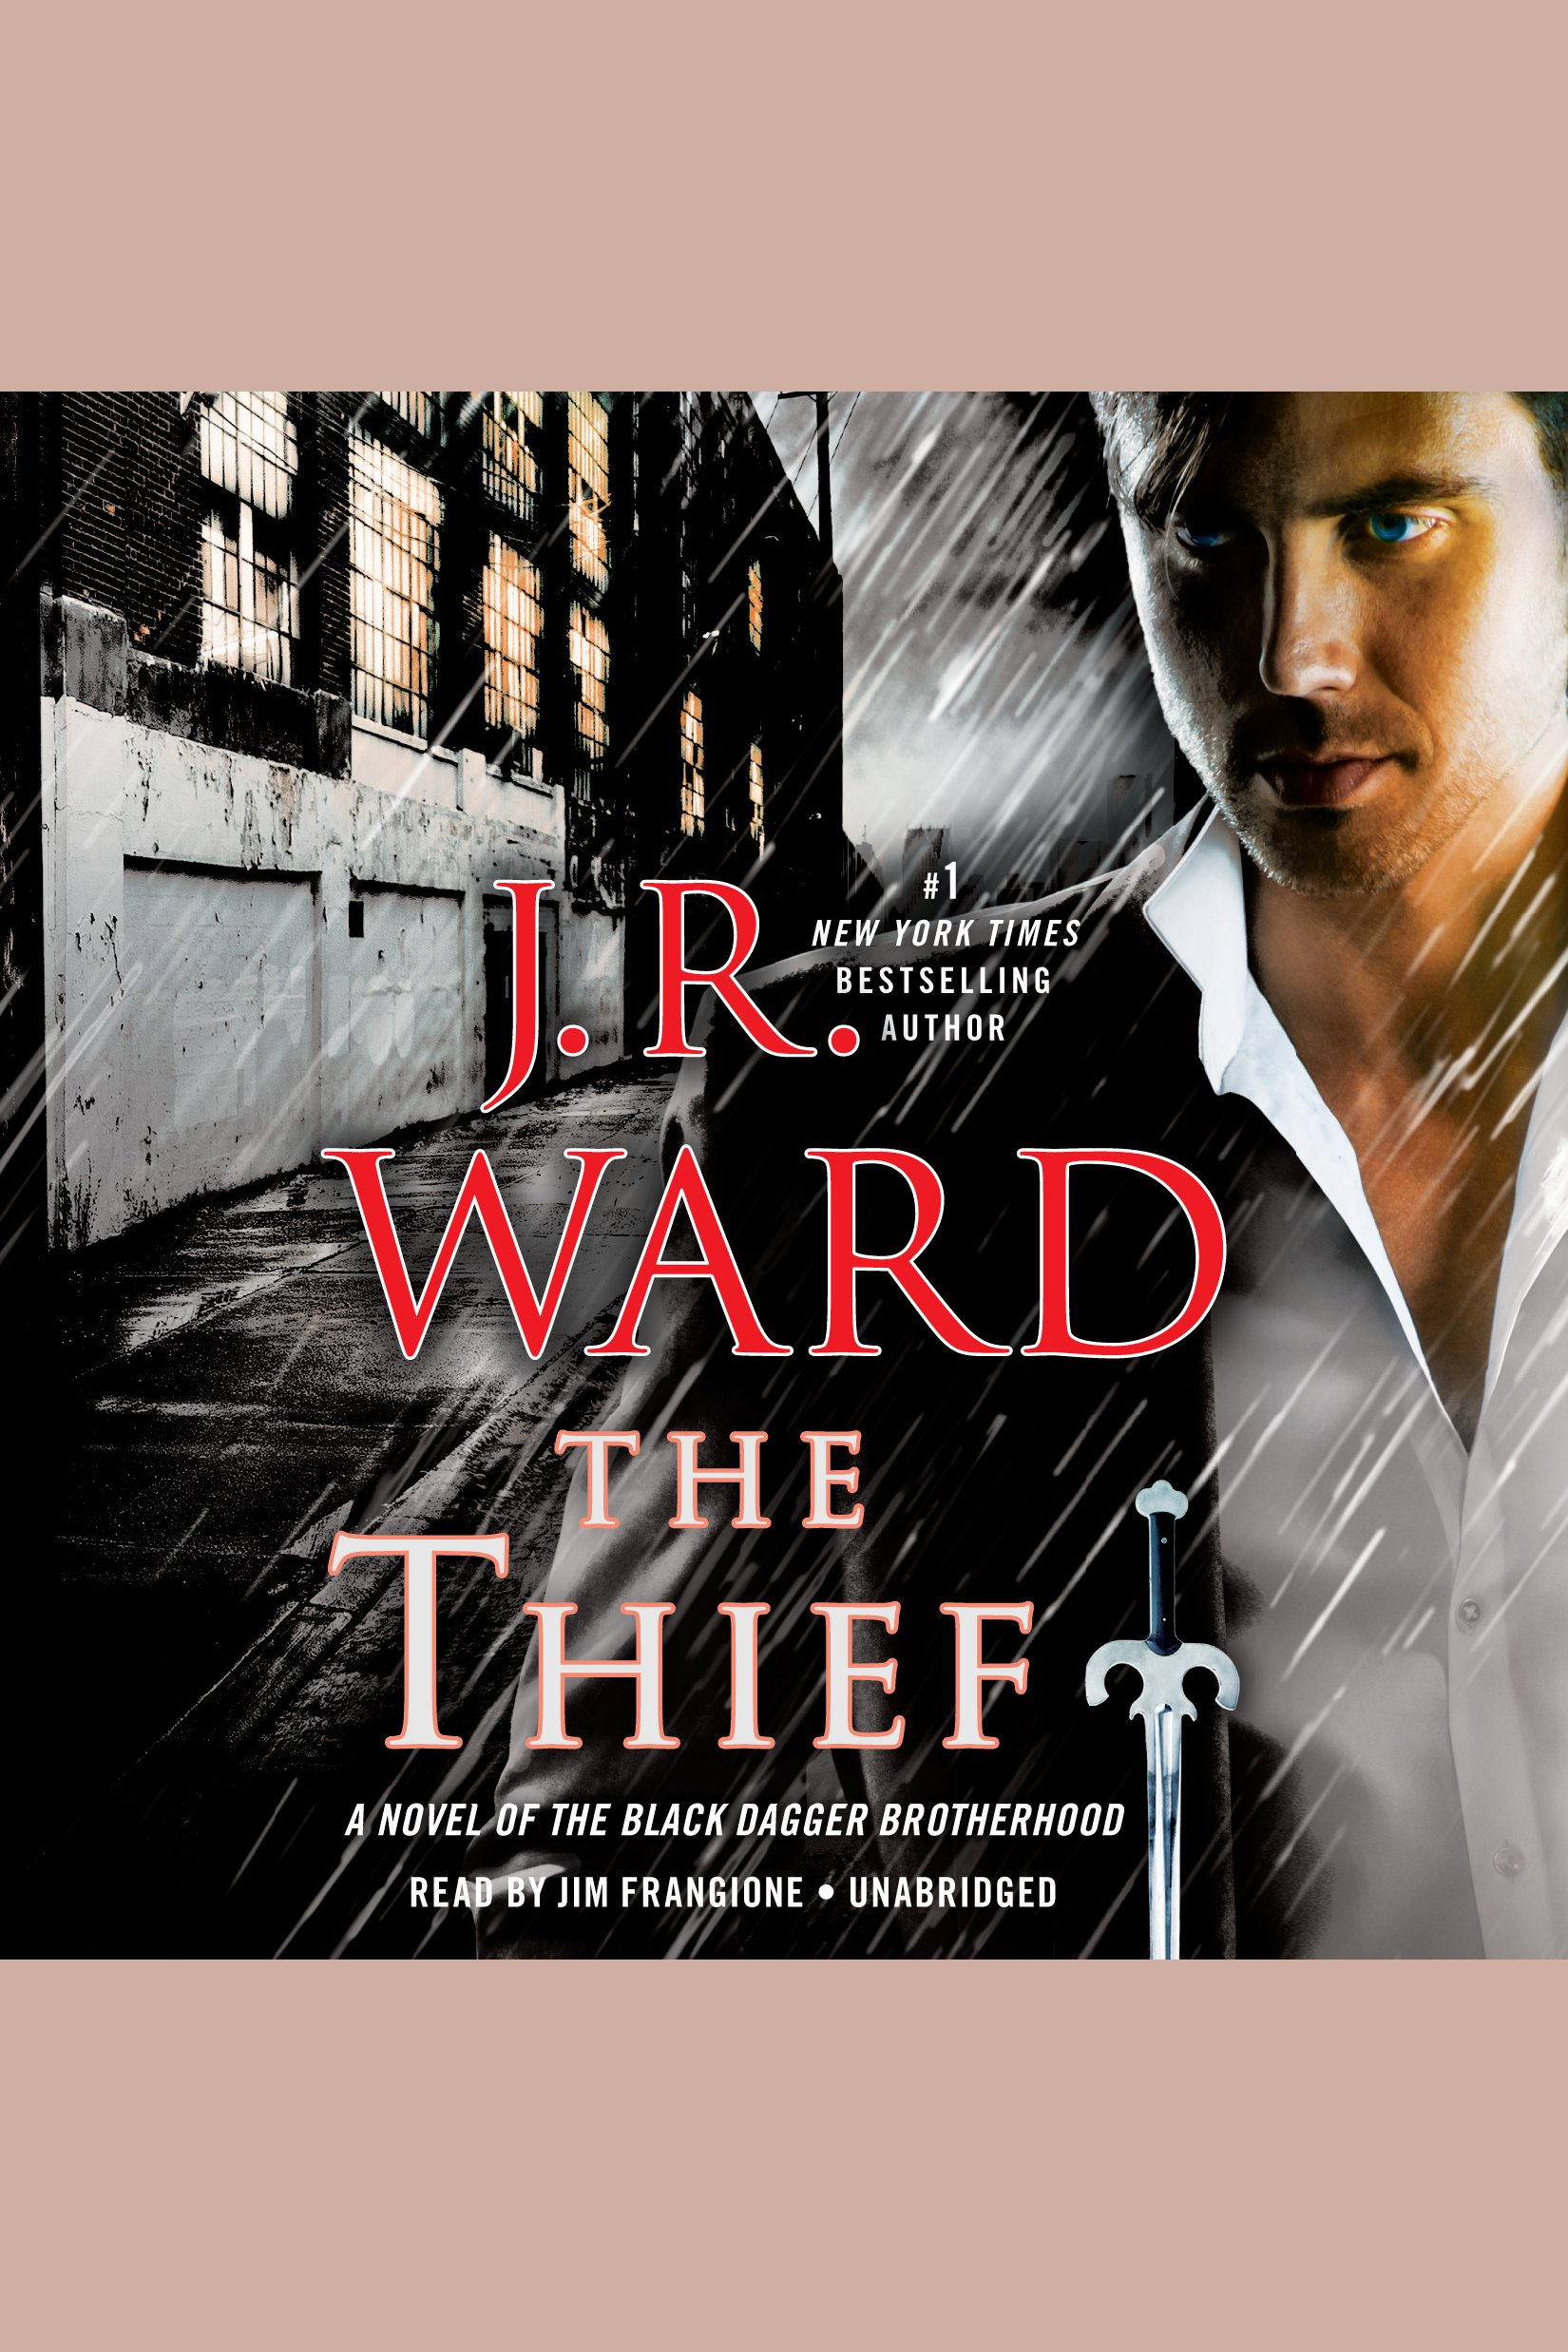 The Thief [EAUDIOBOOK]: A Novel of the Black Dagger Brotherhood